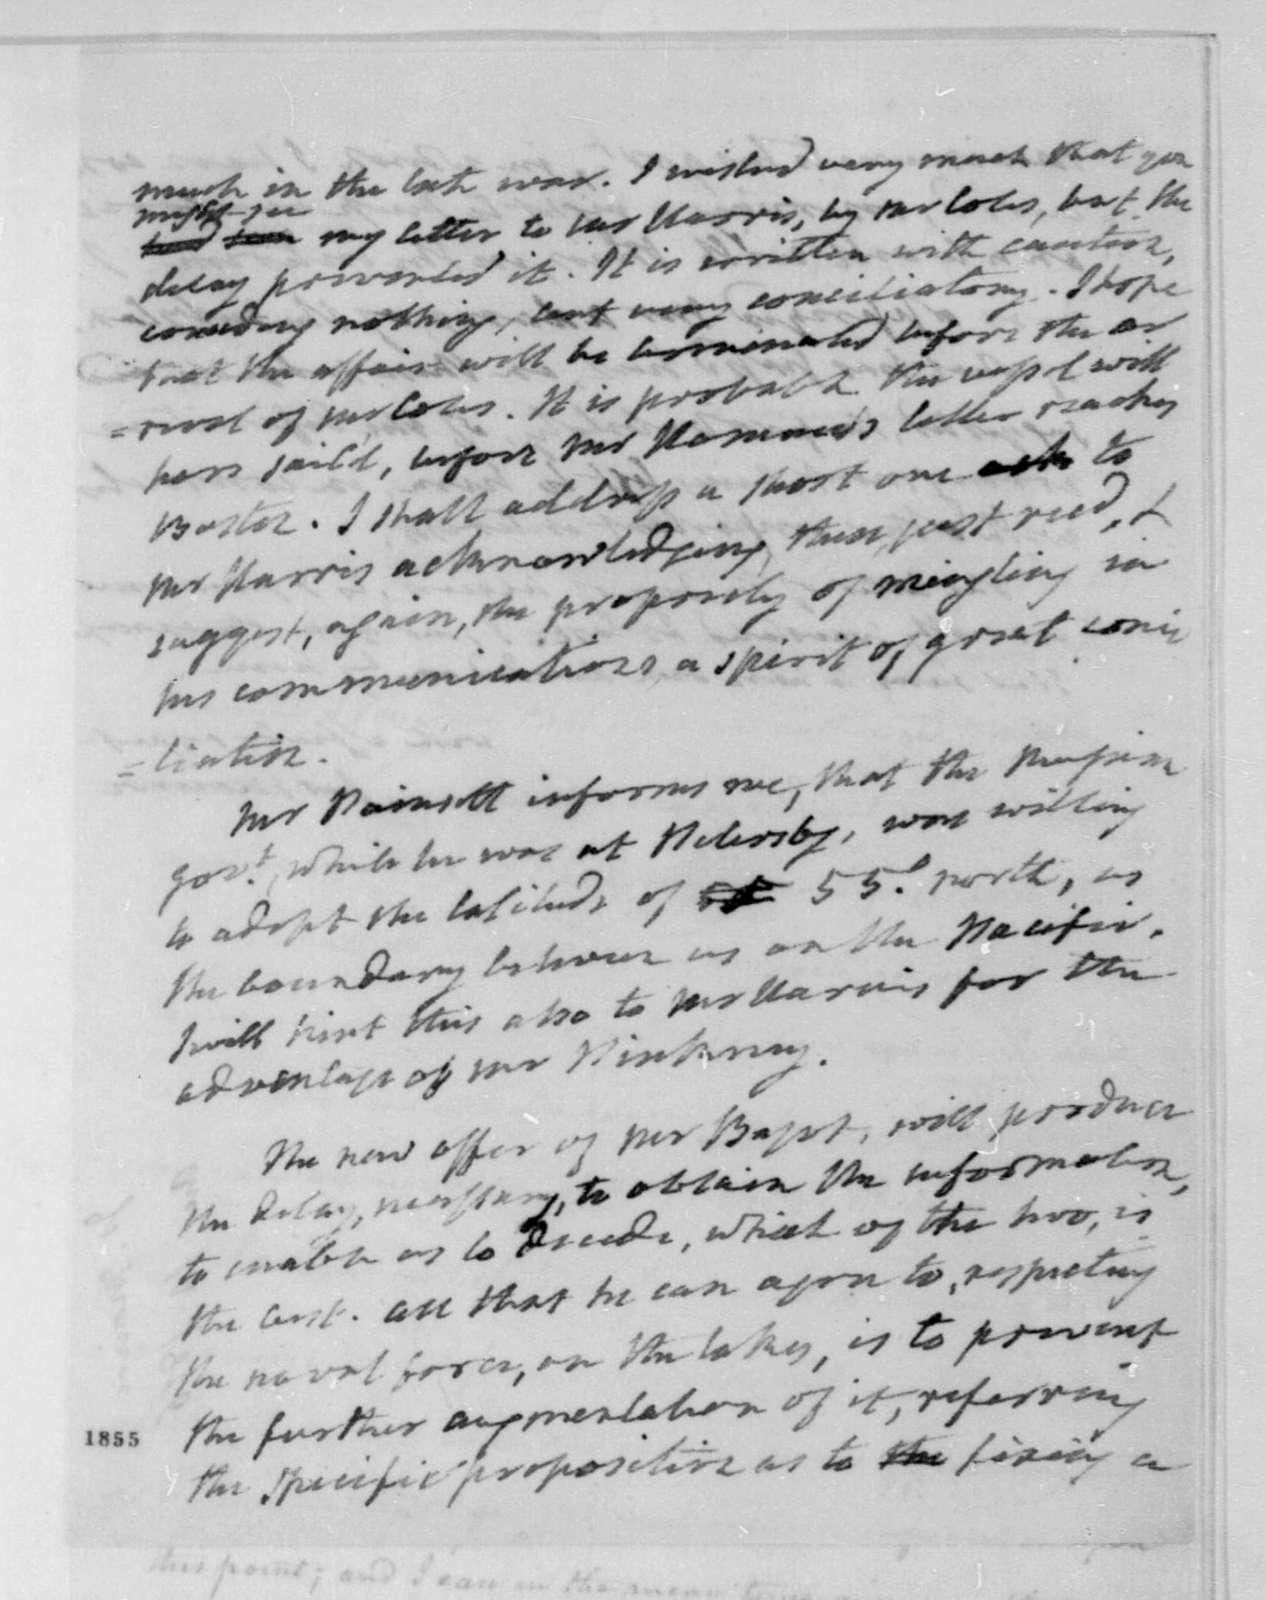 James Monroe to James Madison, August 14, 1816.